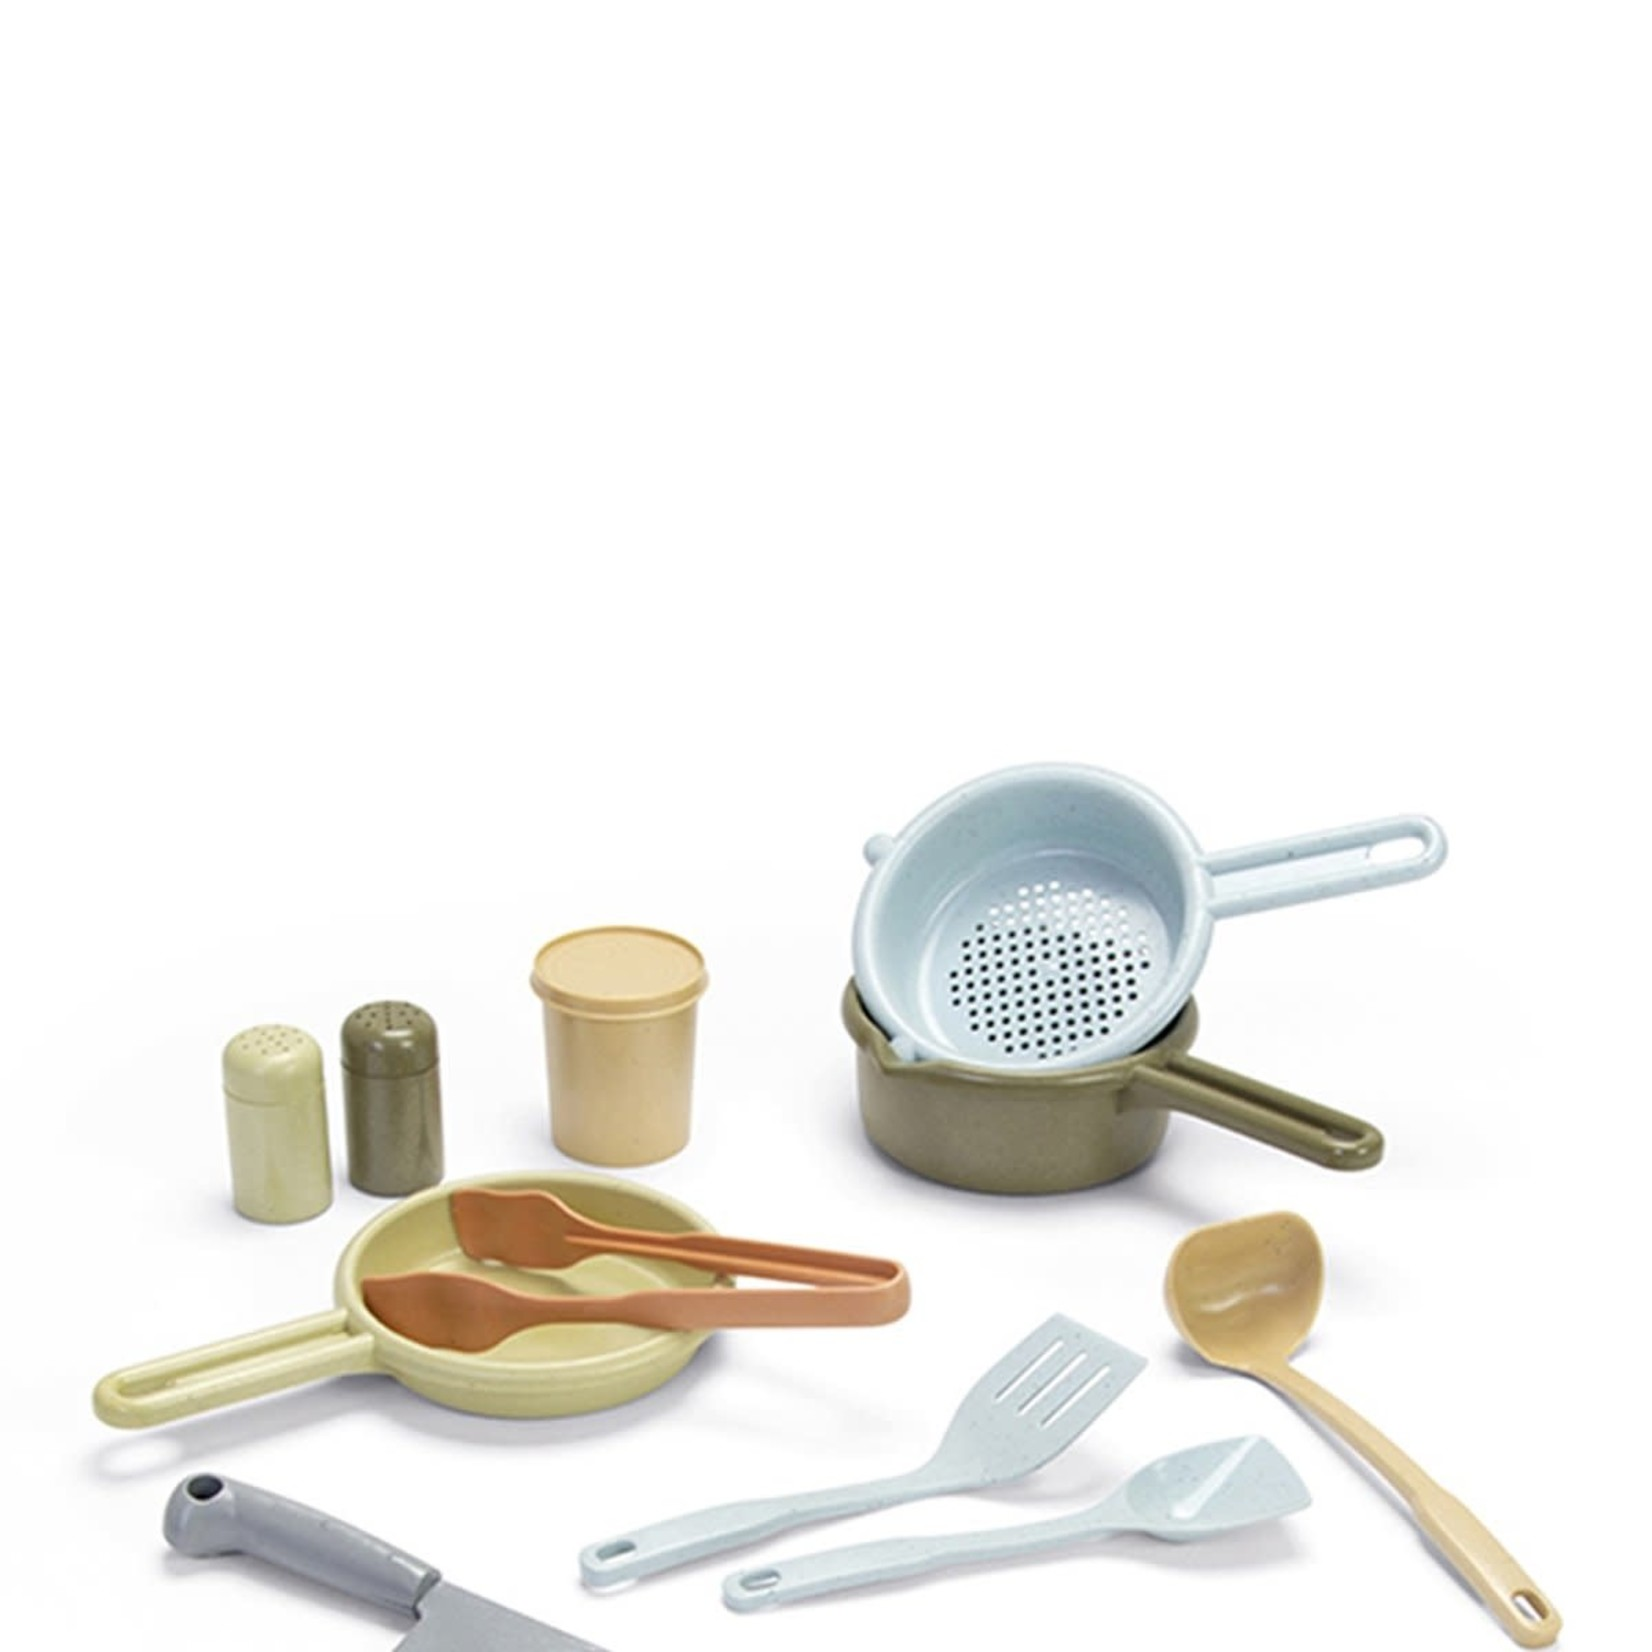 Dantoy Keukensetje in bio-plastic